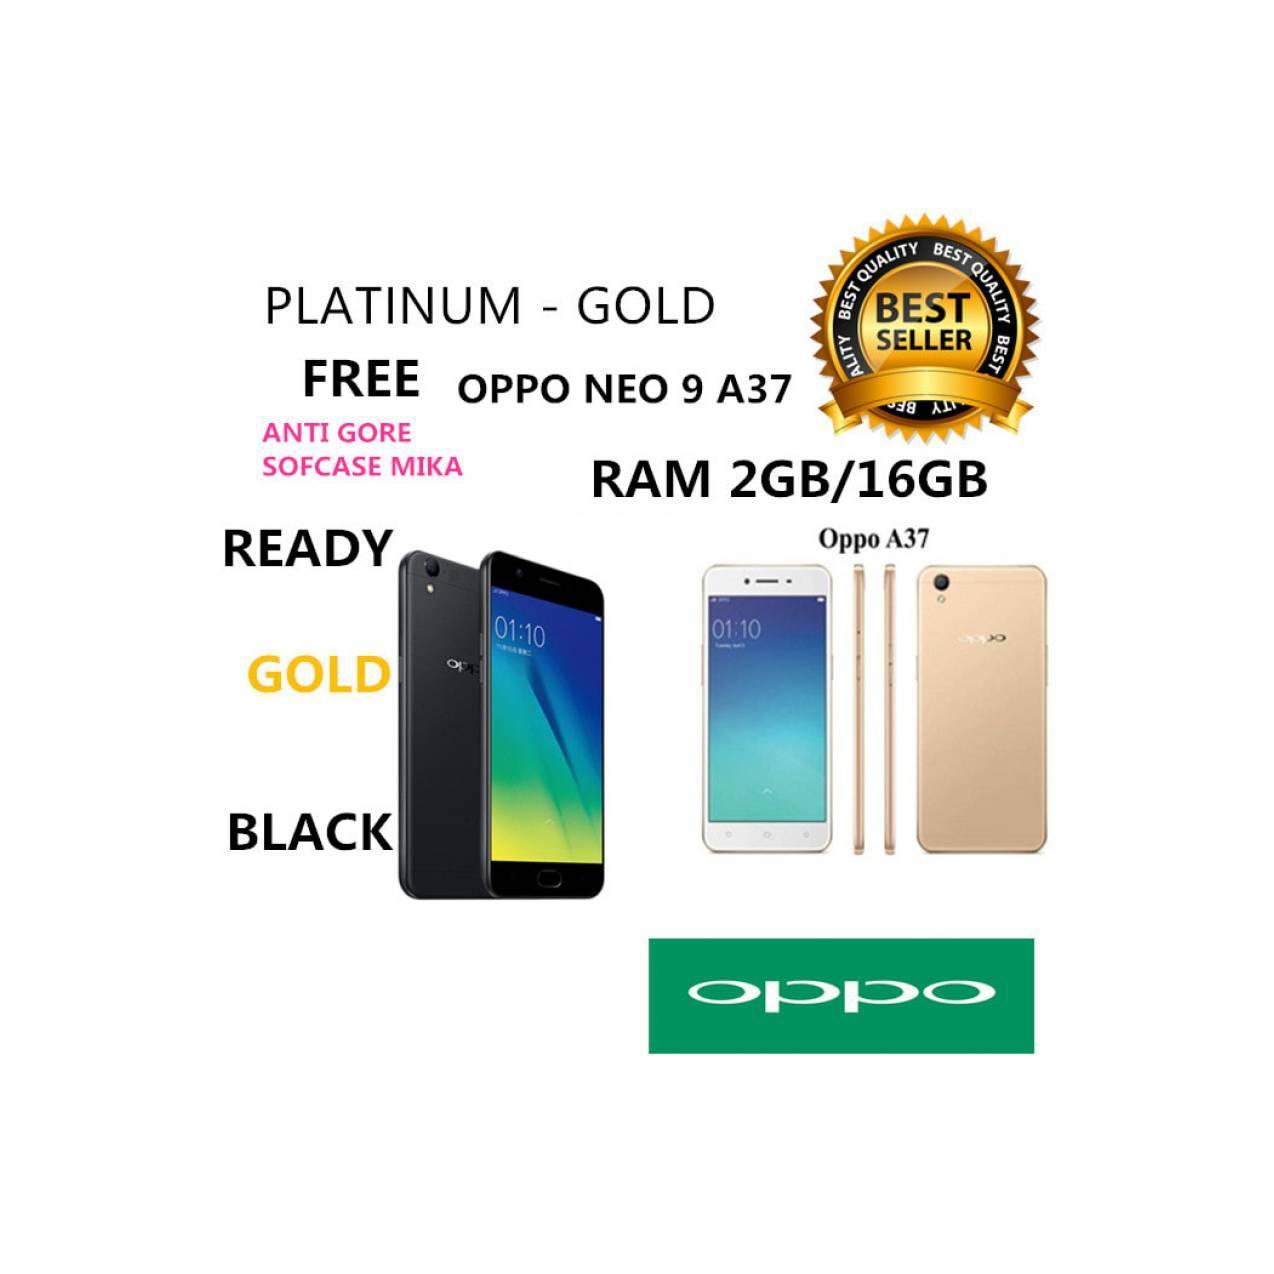 Update Harga Terbaru Hp Xiaomi Oppo November 2018 Id Cost Neo 9 2 16 Gb A37 Ram Rom A 37 Bukan Samsung Asus